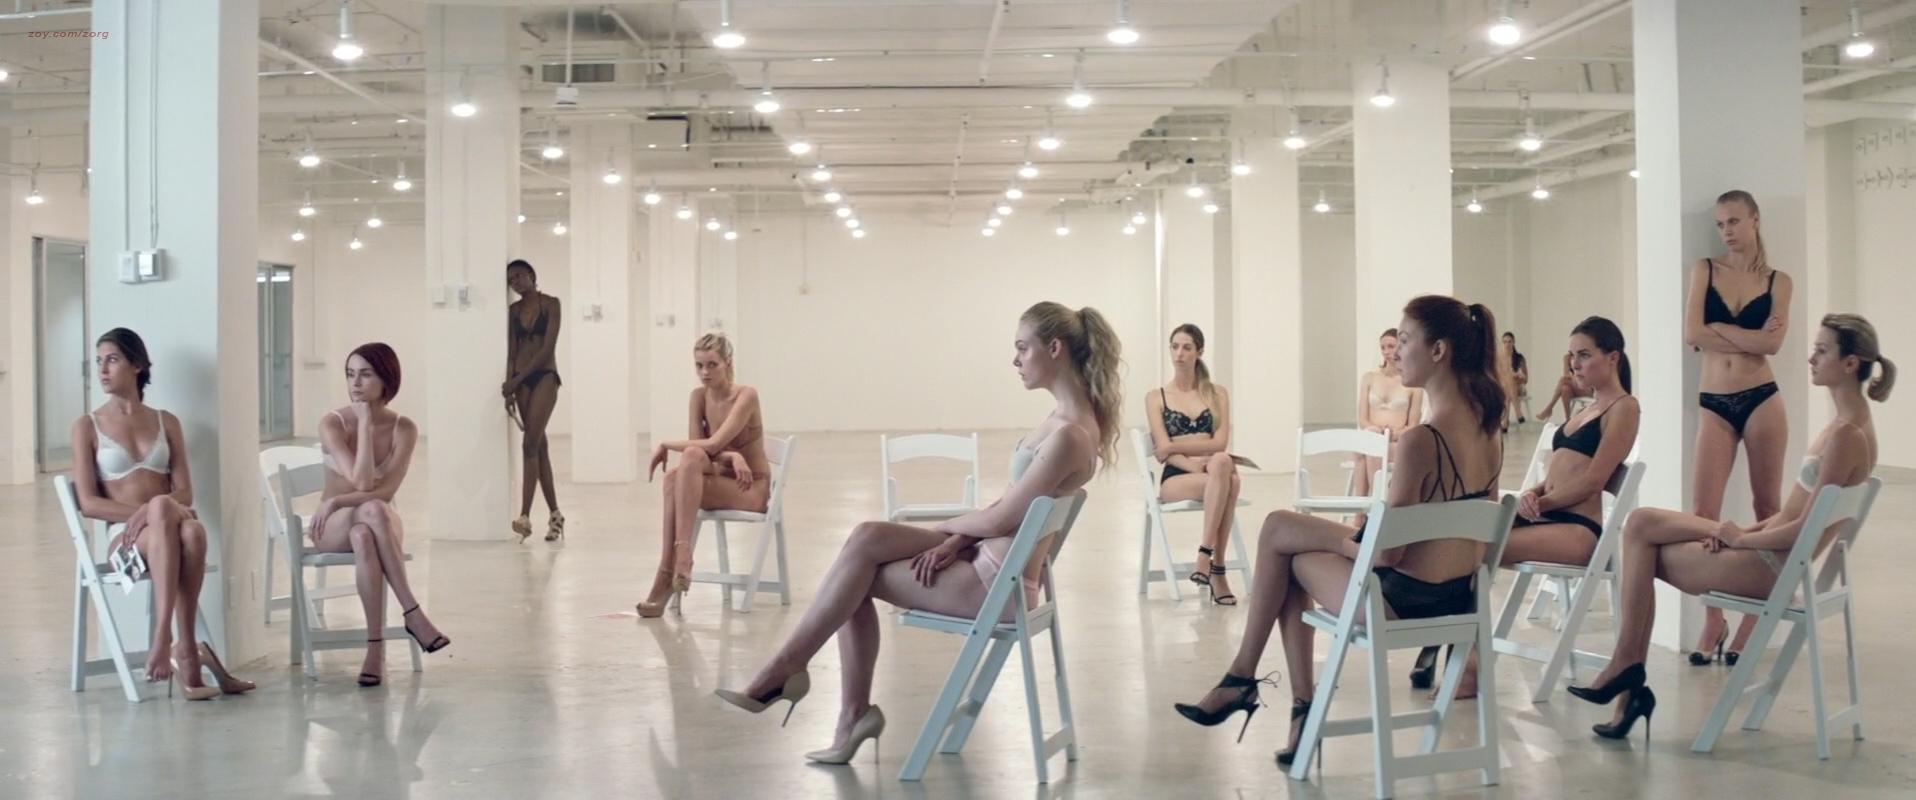 Elle Fanning hot Jena Malone, Bella Heathcote and Abbey Lee nude, topless, bush- The Neon Demon (2016) 1080p WEB-DL (14)